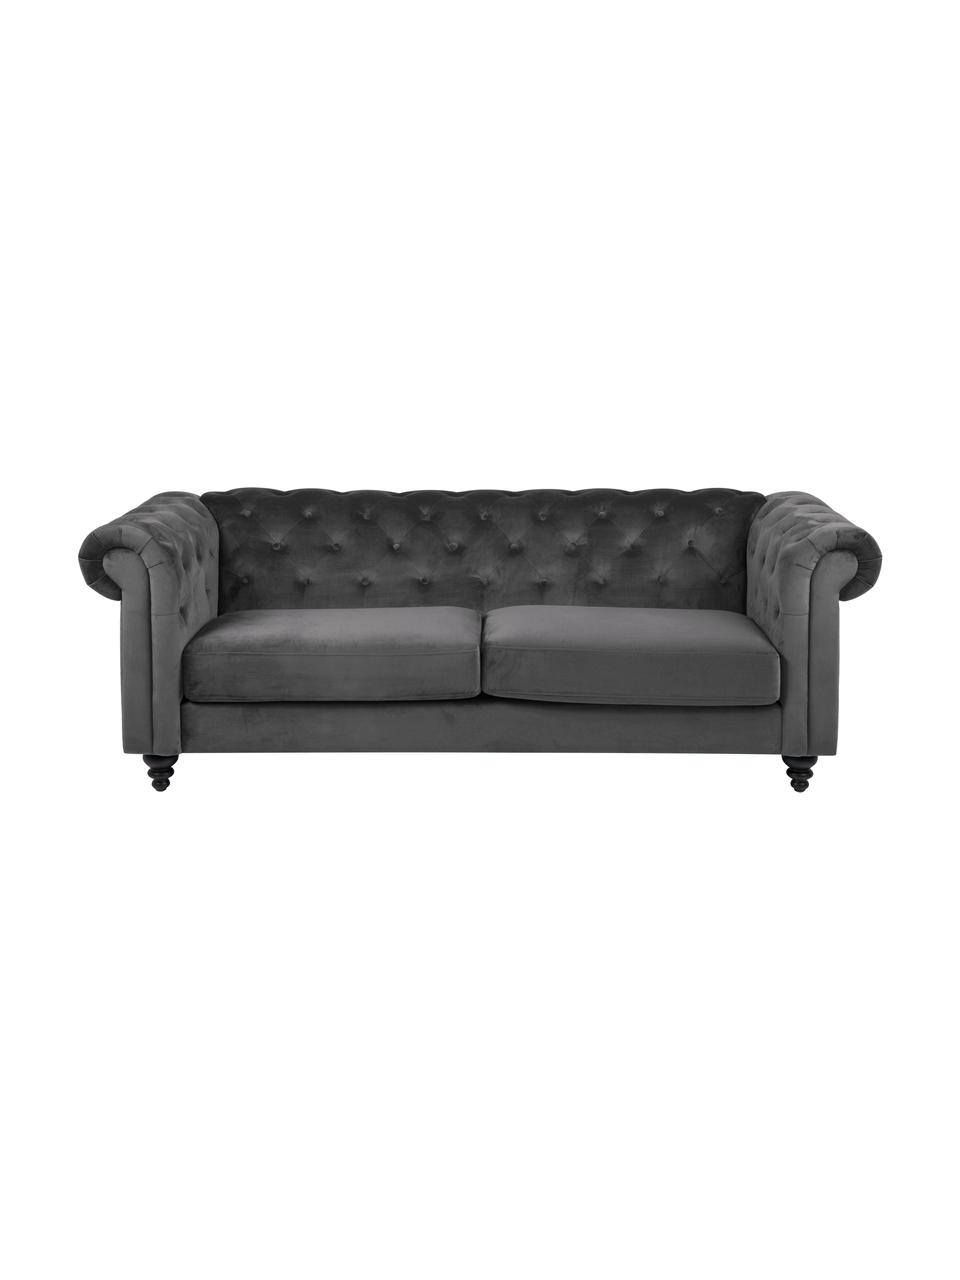 Fluwelen chesterfield bank Charlietown (3-zits) in donkergrijs, Bekleding: 100% polyester, Poten: rubberhout, gecoat, Donkergrijs, zwart, 219 x 88 cm